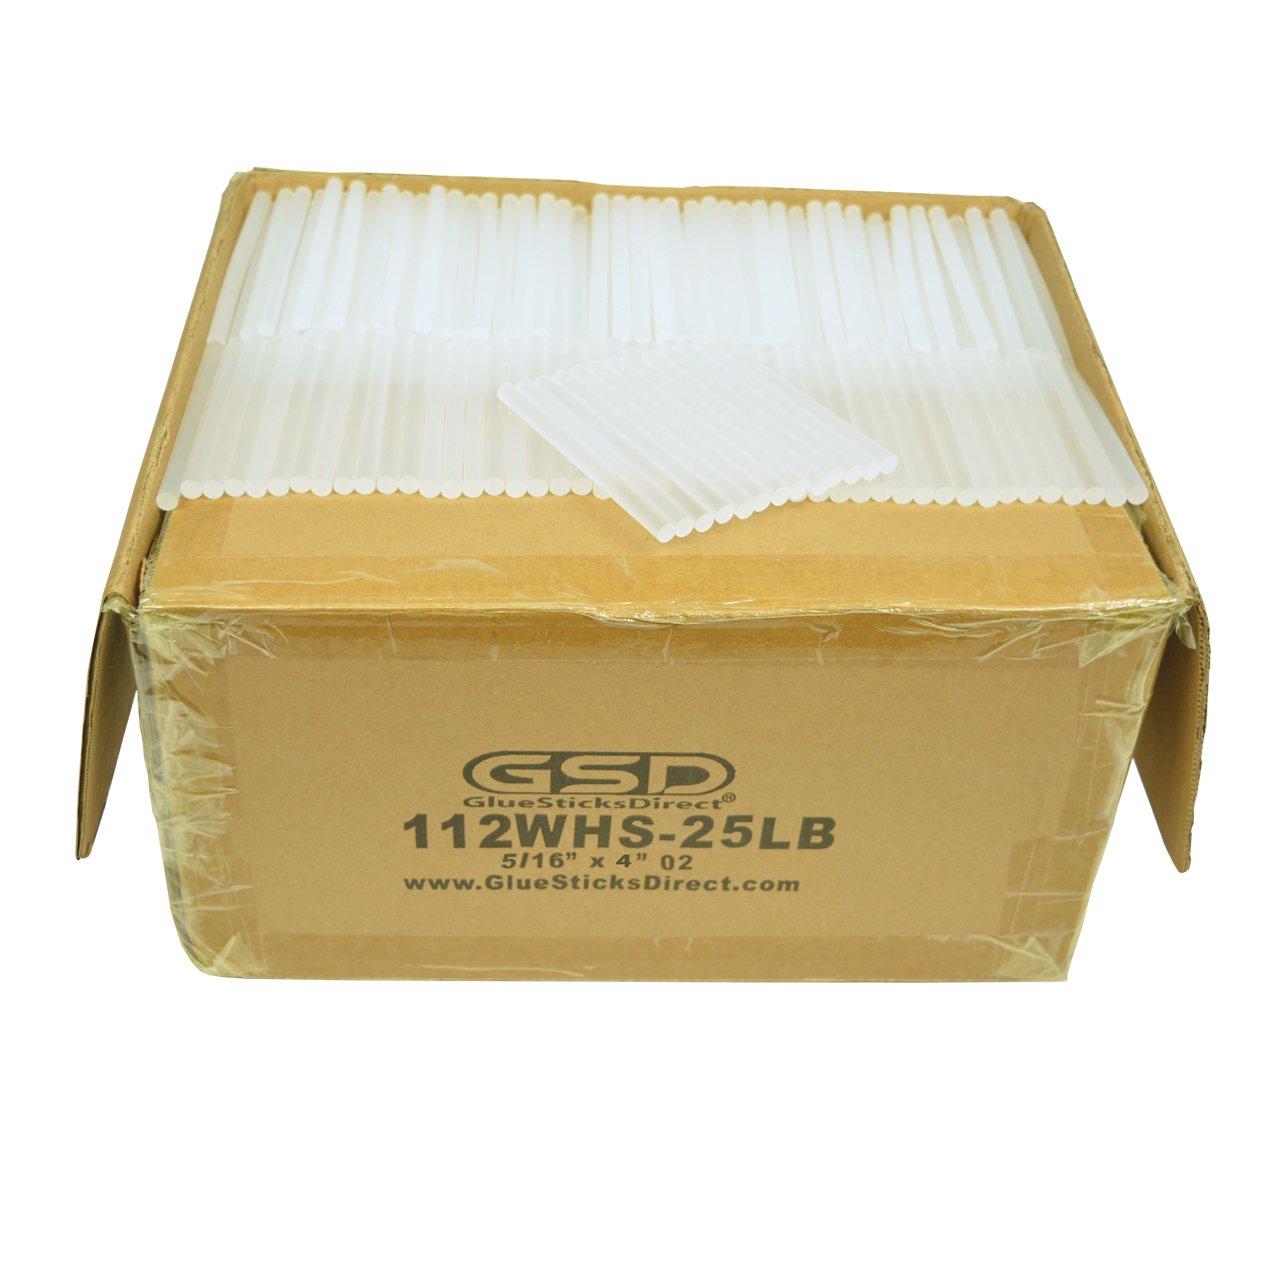 GlueSticksDirect Wholesale Hot Melt Glue Stick mini X 4'' 25 lbs Bulk